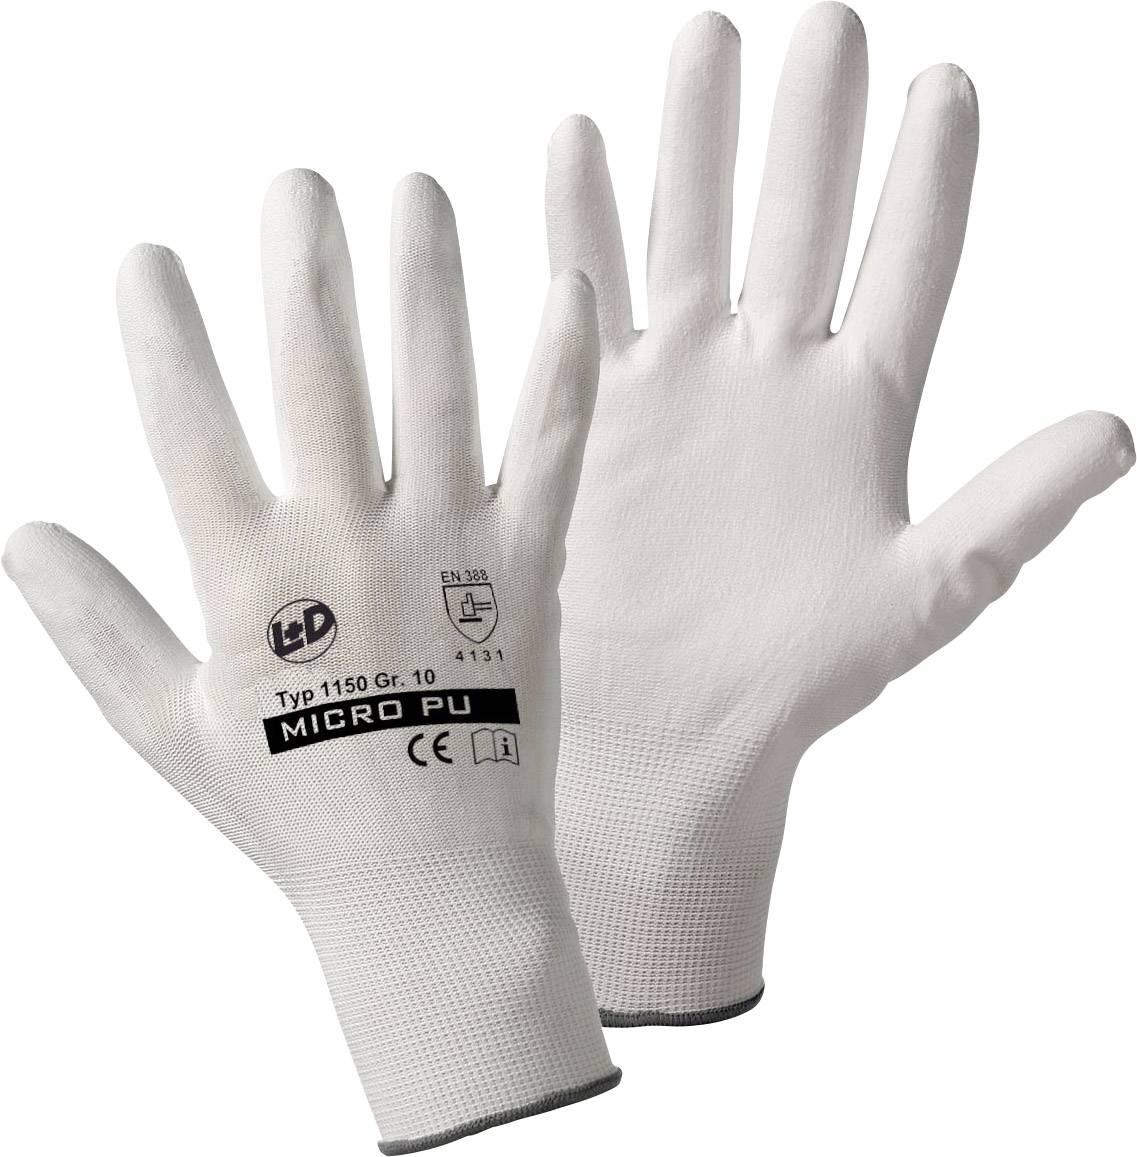 Pracovné rukavice Leipold + Döhle Micro-PU knitted 1150, velikost rukavic: 9, L